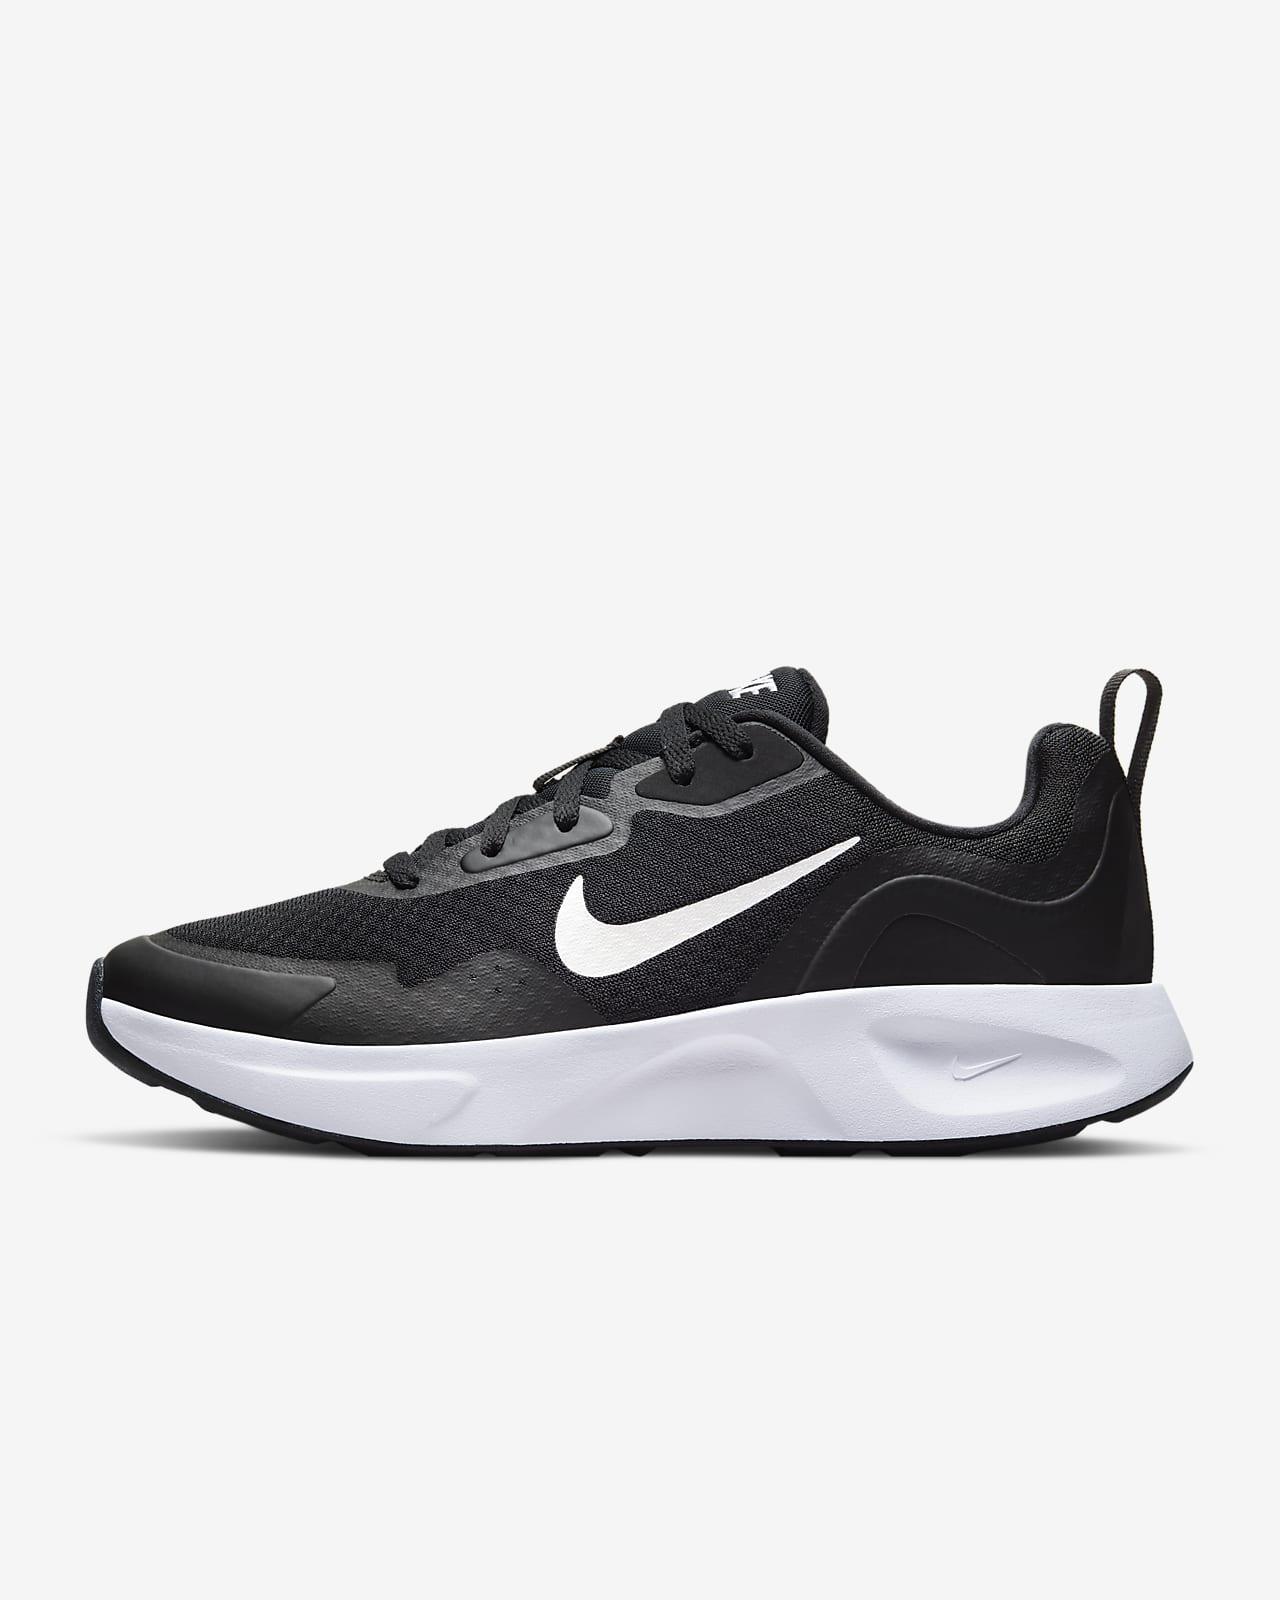 nike sport women's shoes